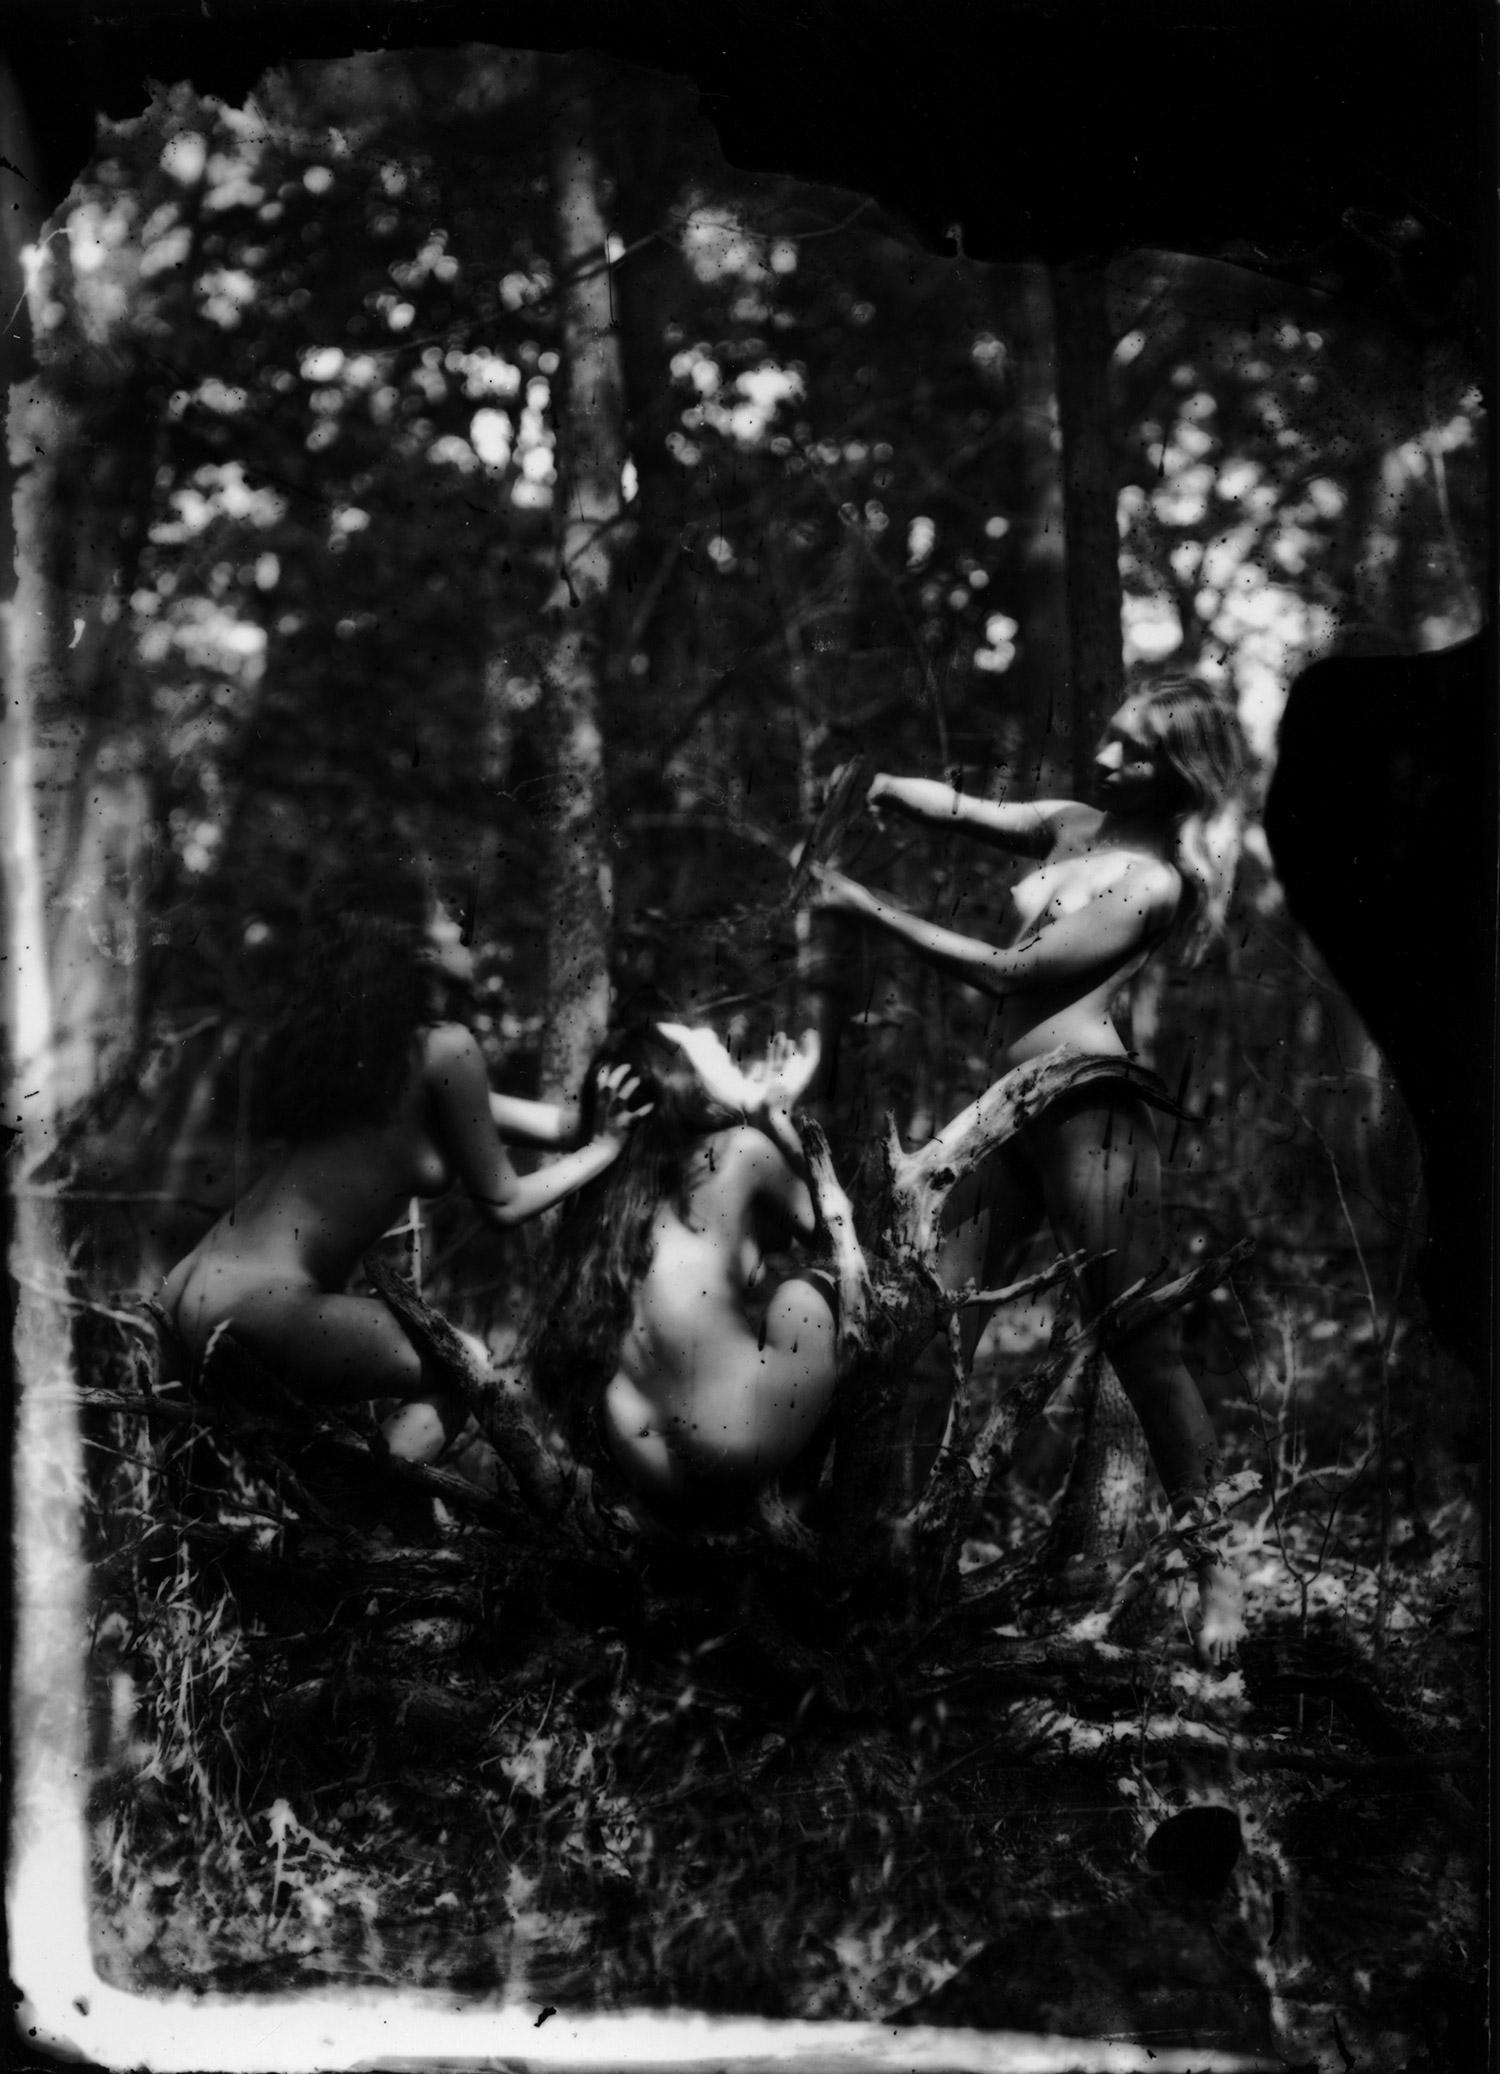 Rik Garrett, Earth Magic - three women